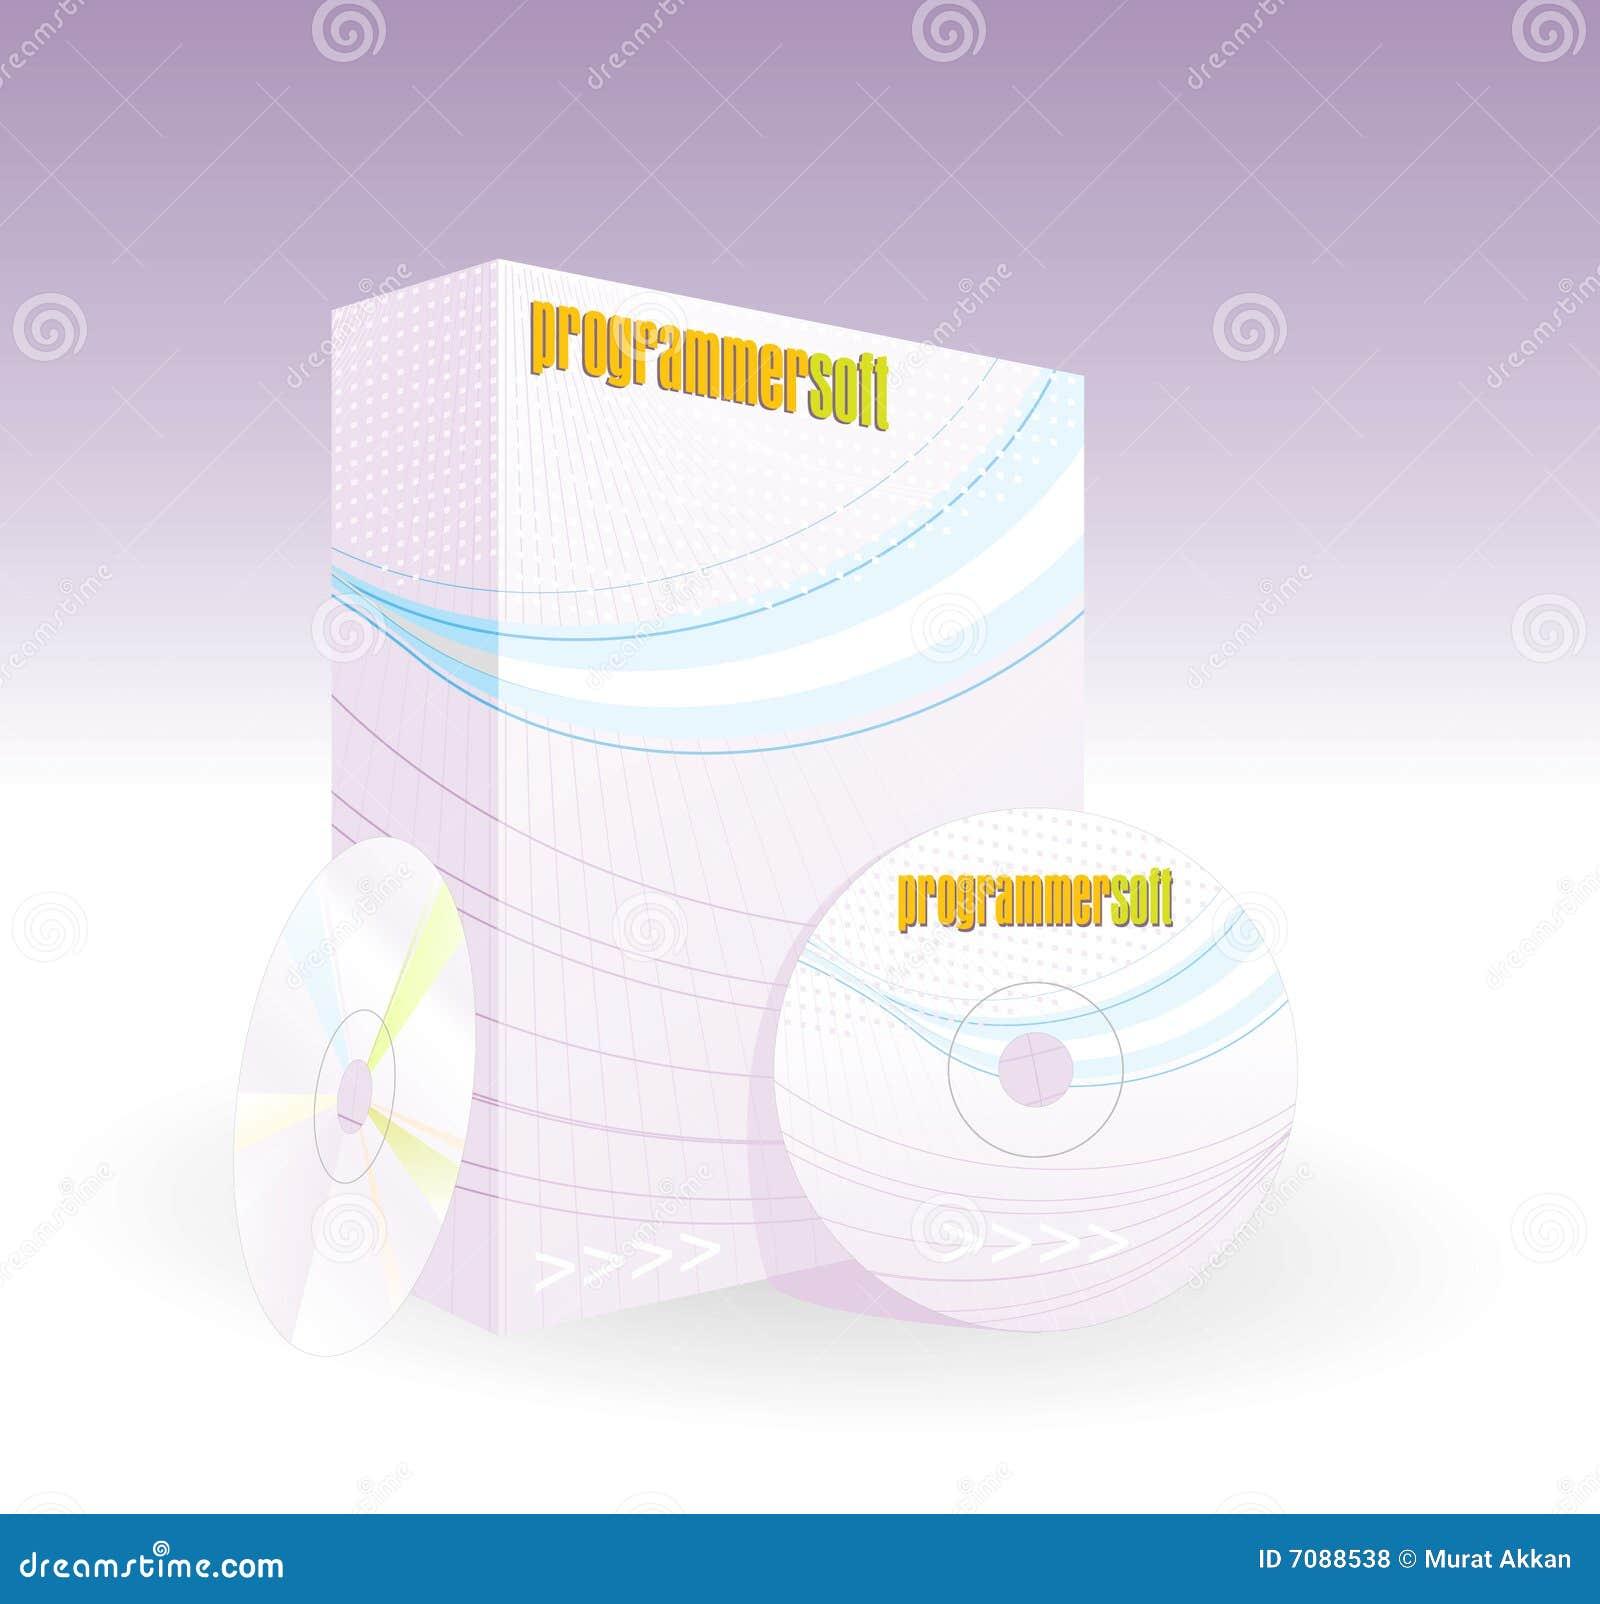 Vector software royalty free stock photos image 7088538 Vector image software